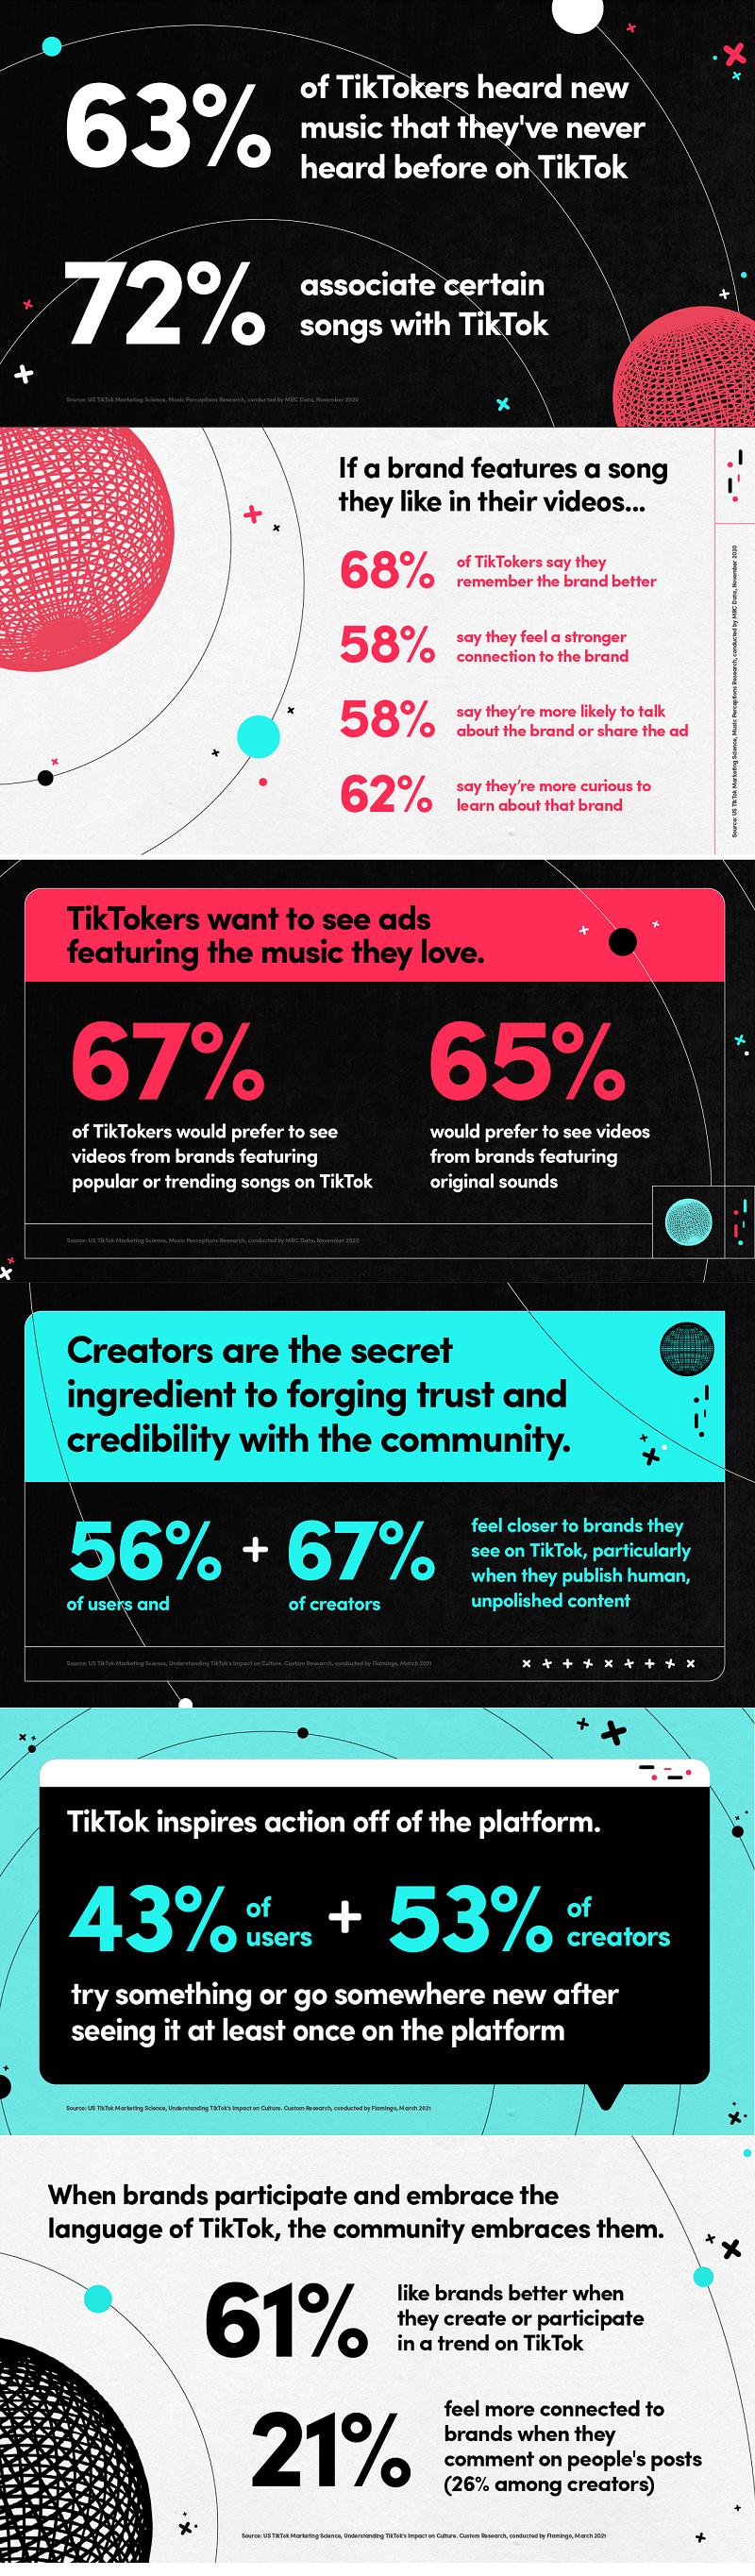 TikTok music infographic